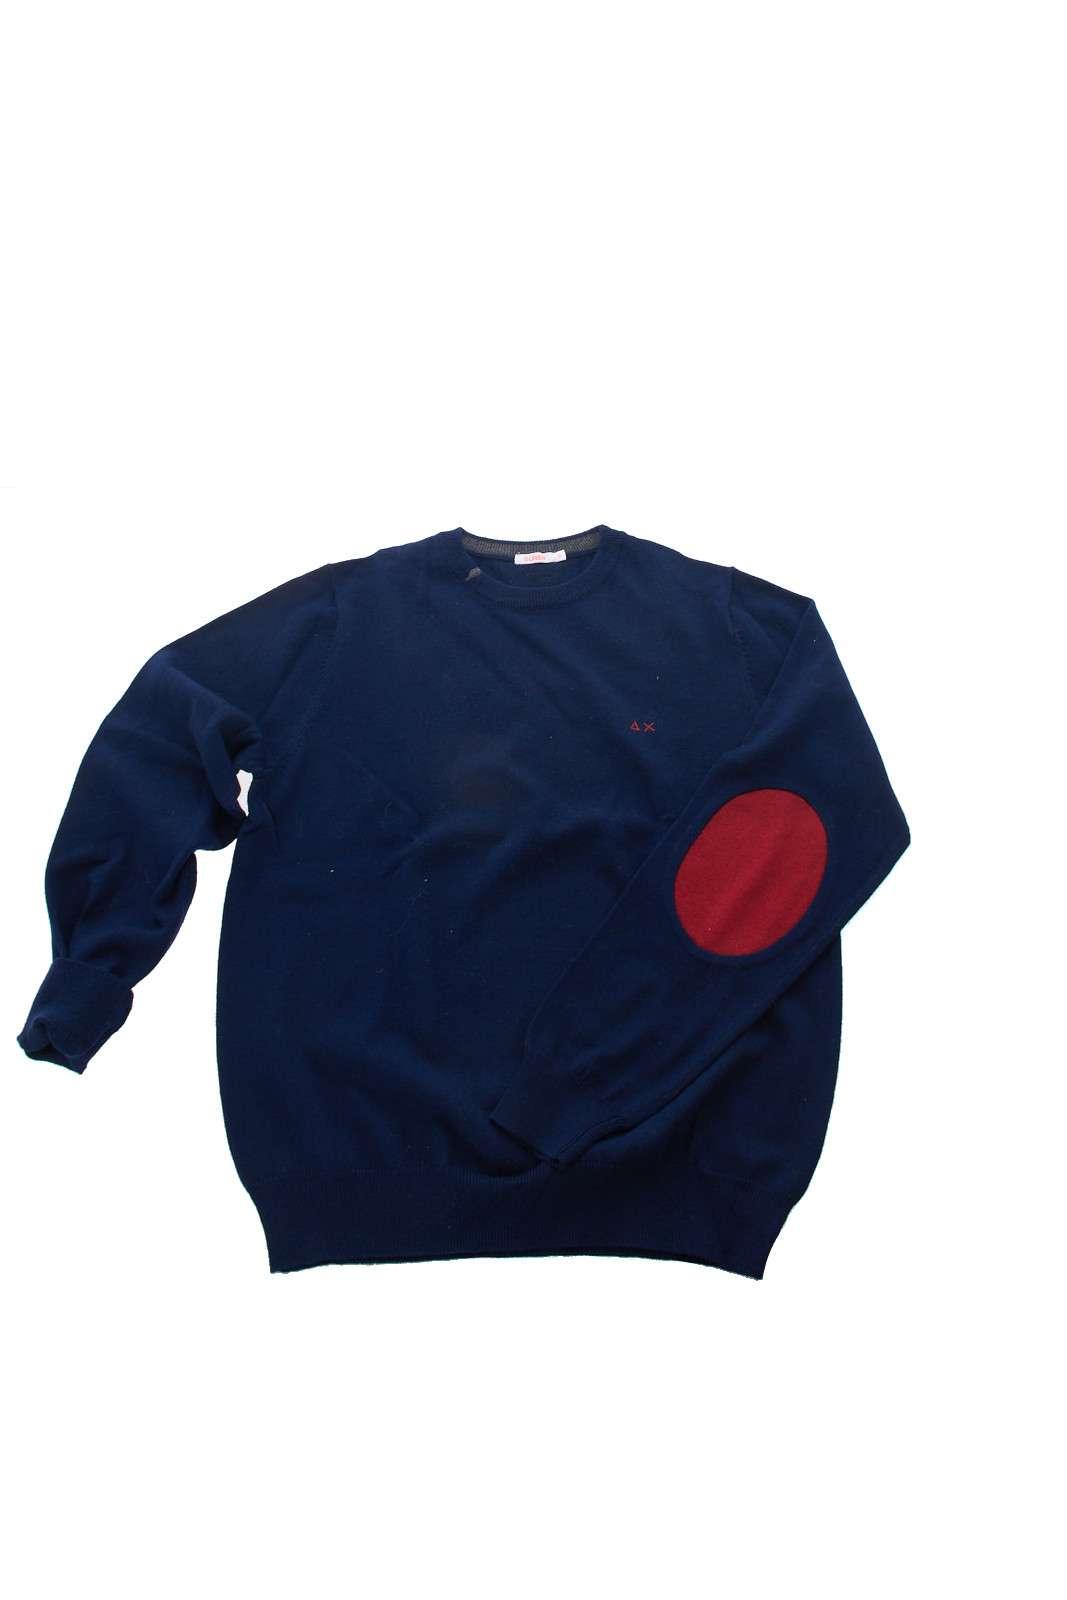 https://www.parmax.com/media/catalog/product/a/i/AI-outlet_parmax-maglia-bambino-sun%2068-26354-A.jpg